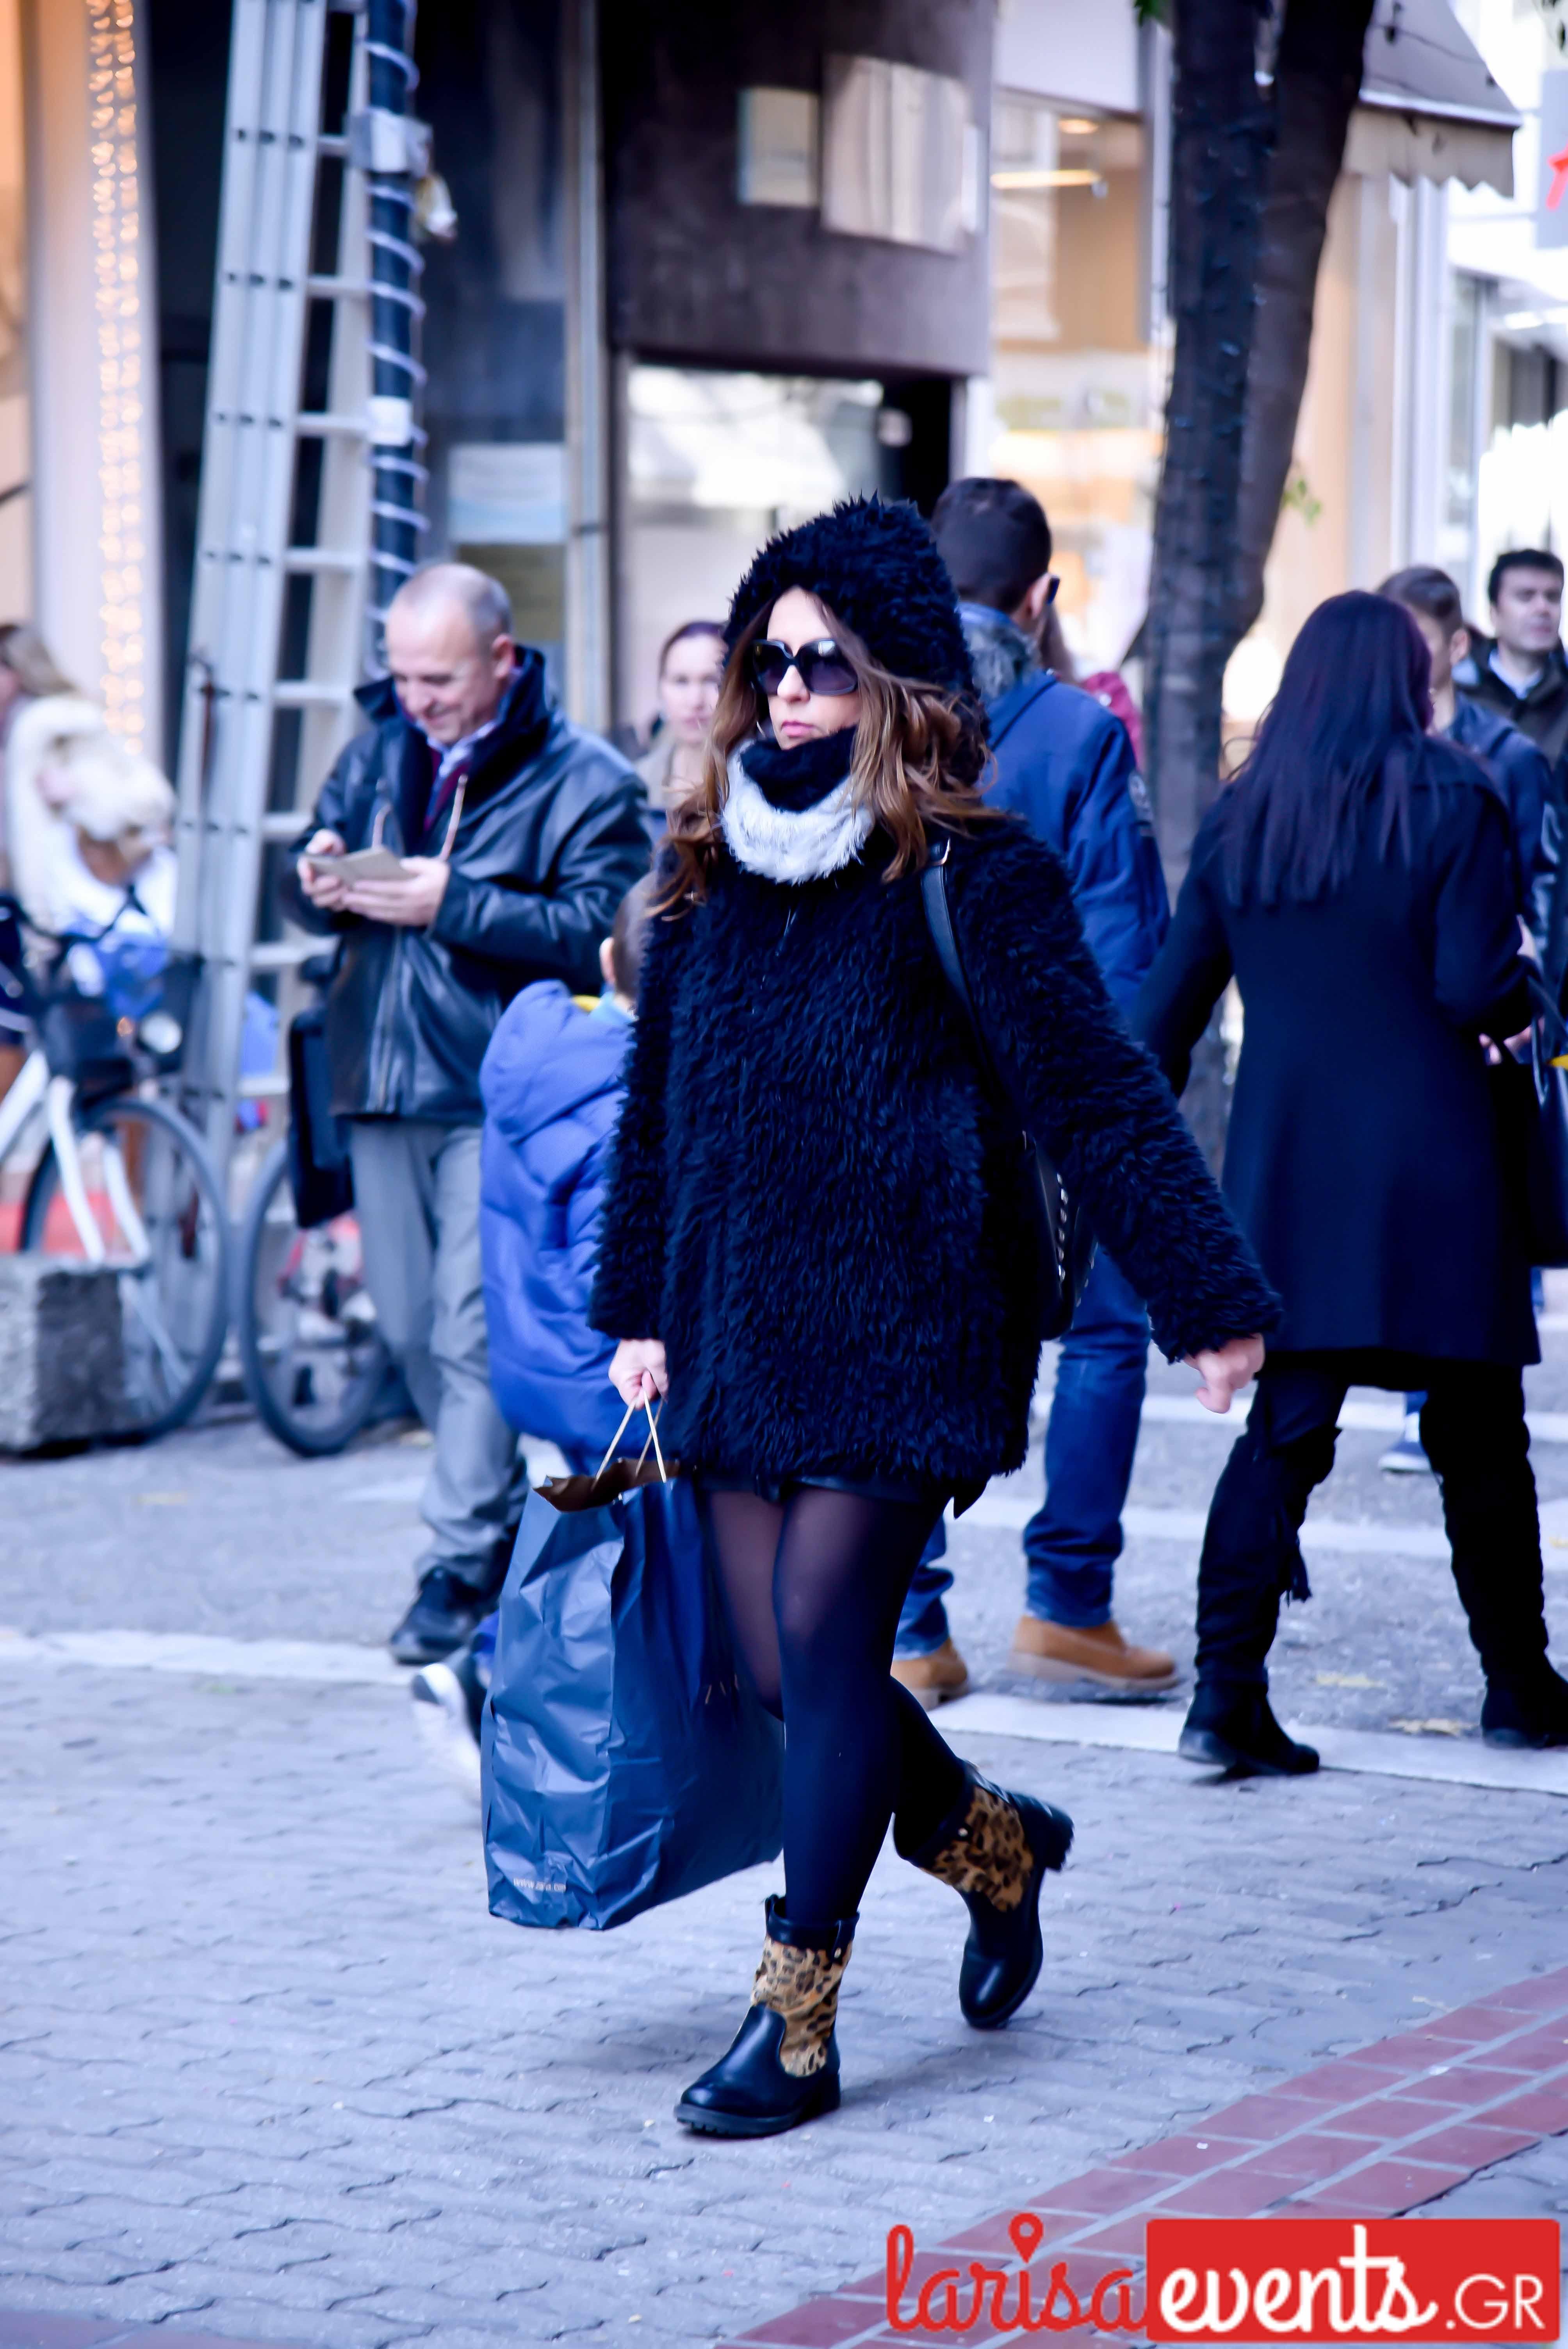 LAZ 7405 - Λάρισα's Street Style | Οι γυναίκες της πόλης σε street style clicks!